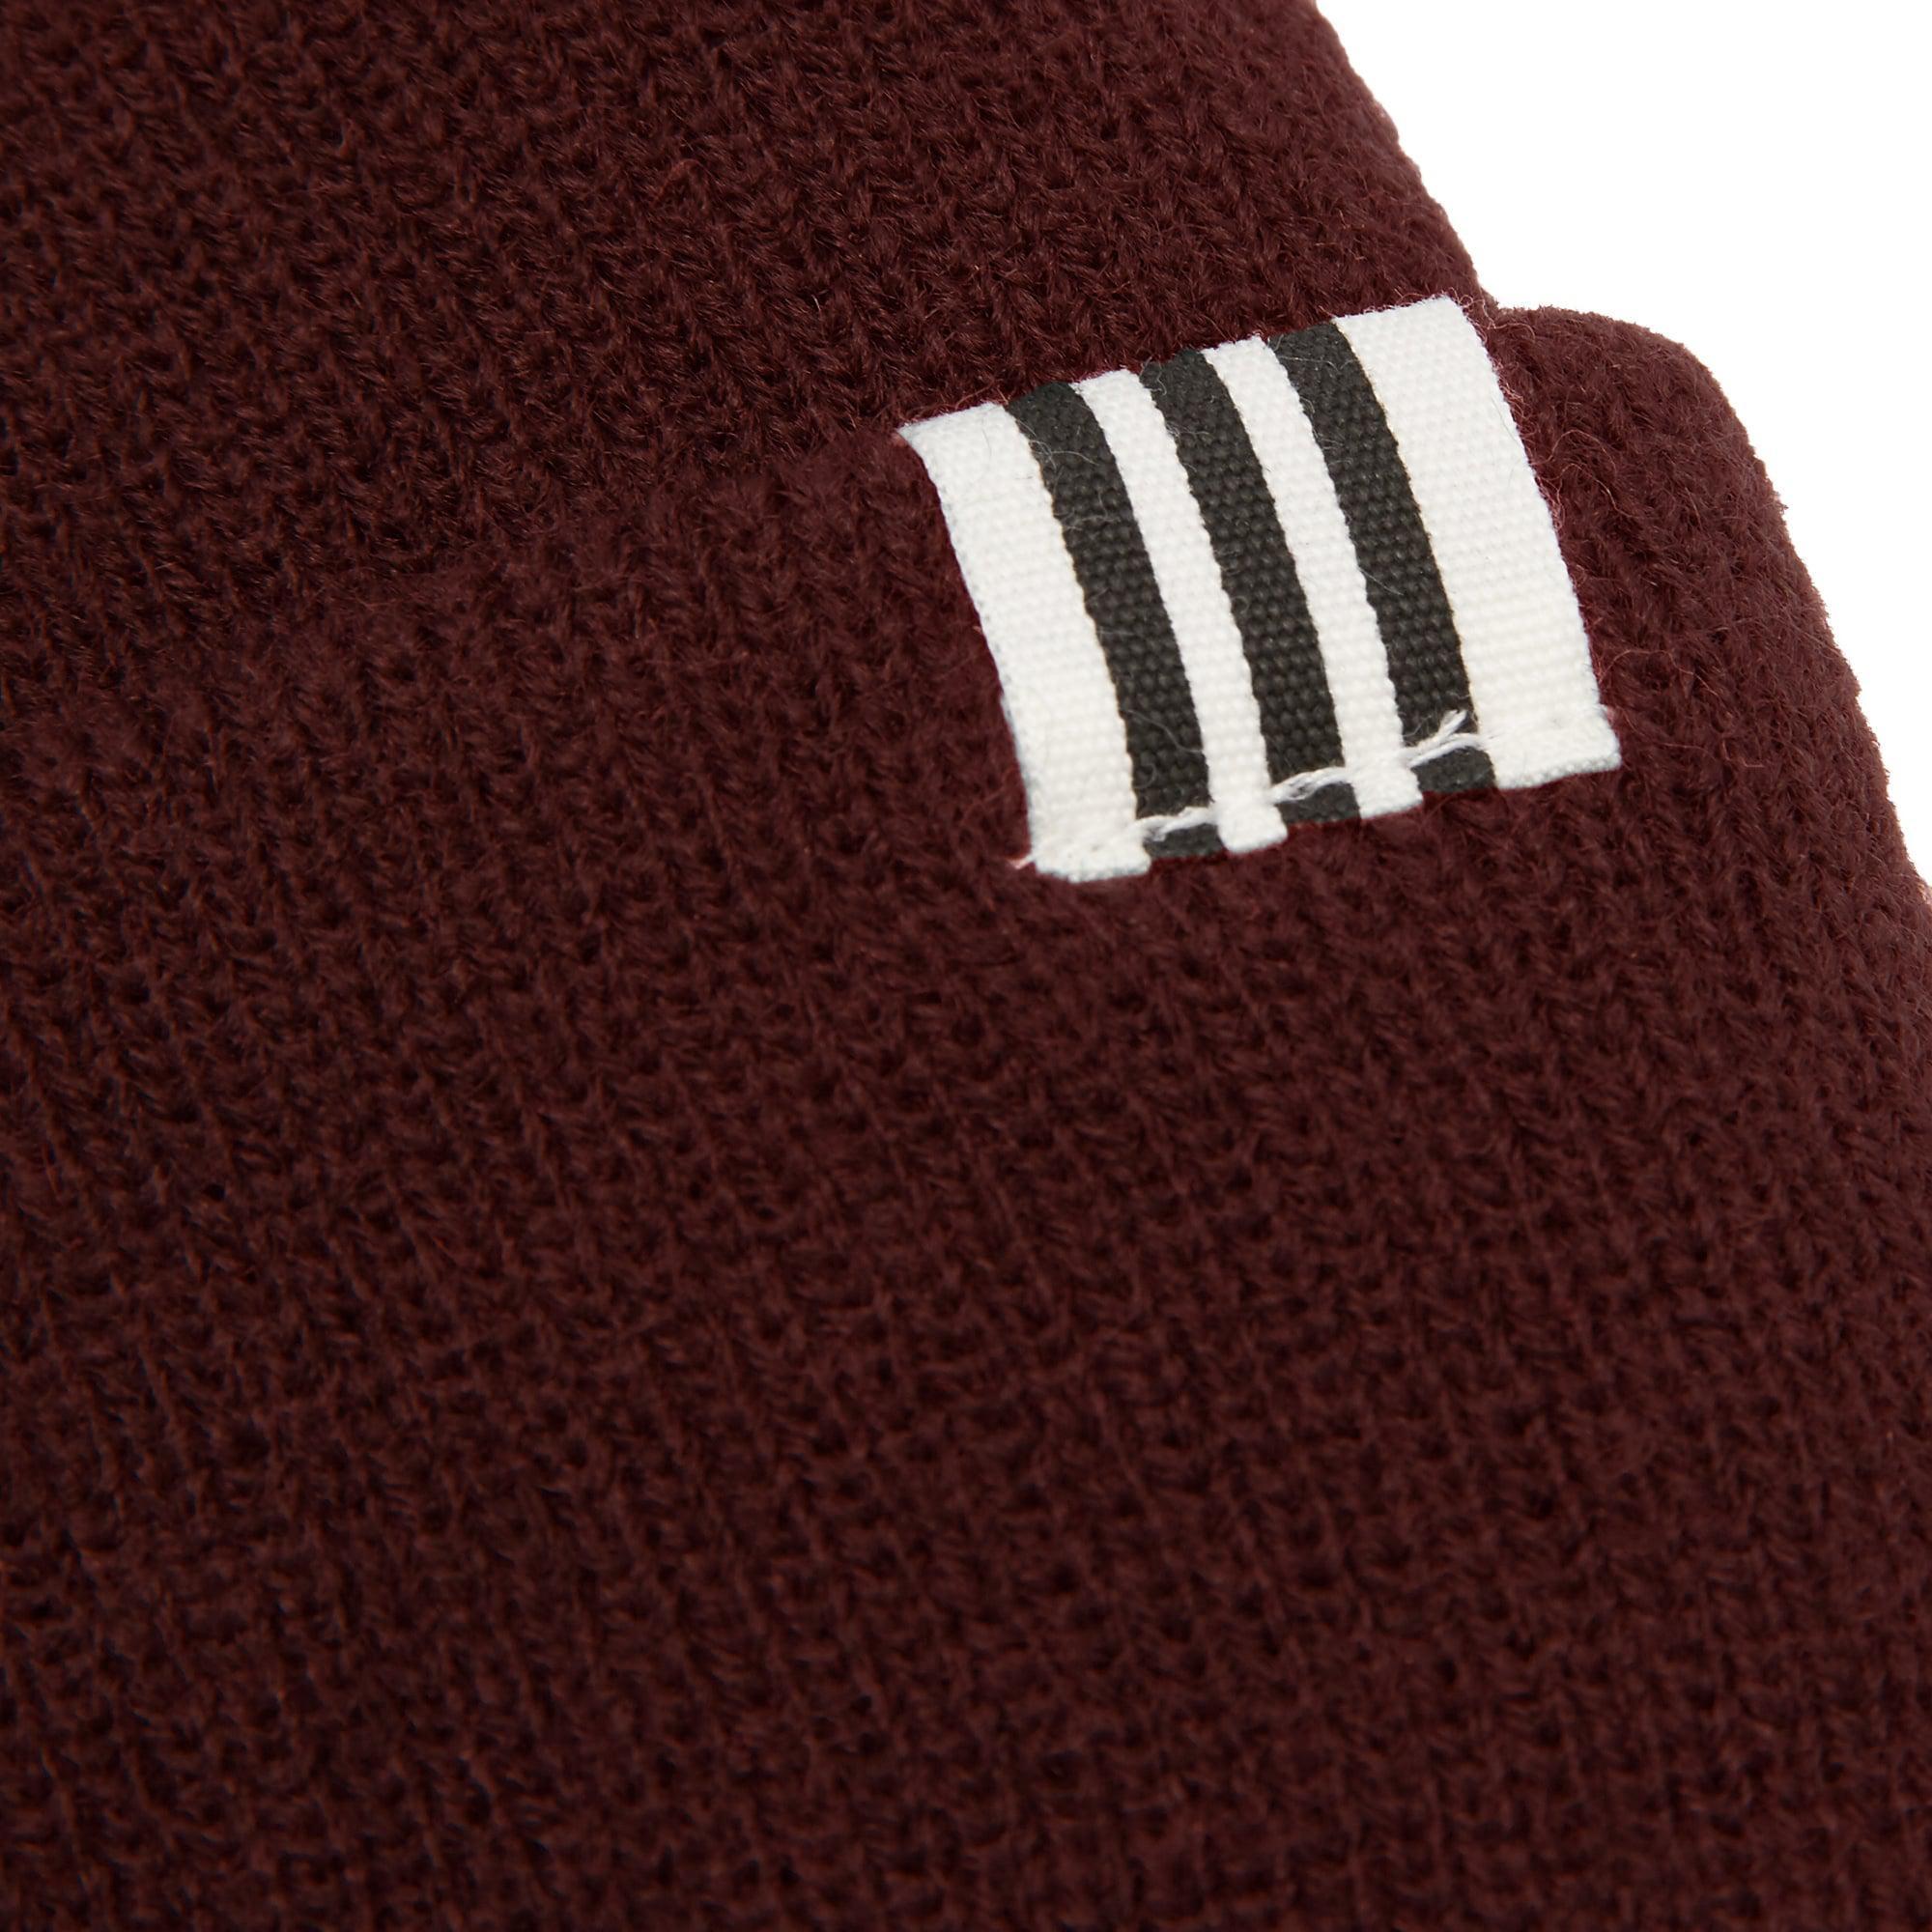 adidas Originals Collegiate Burgundy High Beanie for Men - Lyst c59c2a17cb2